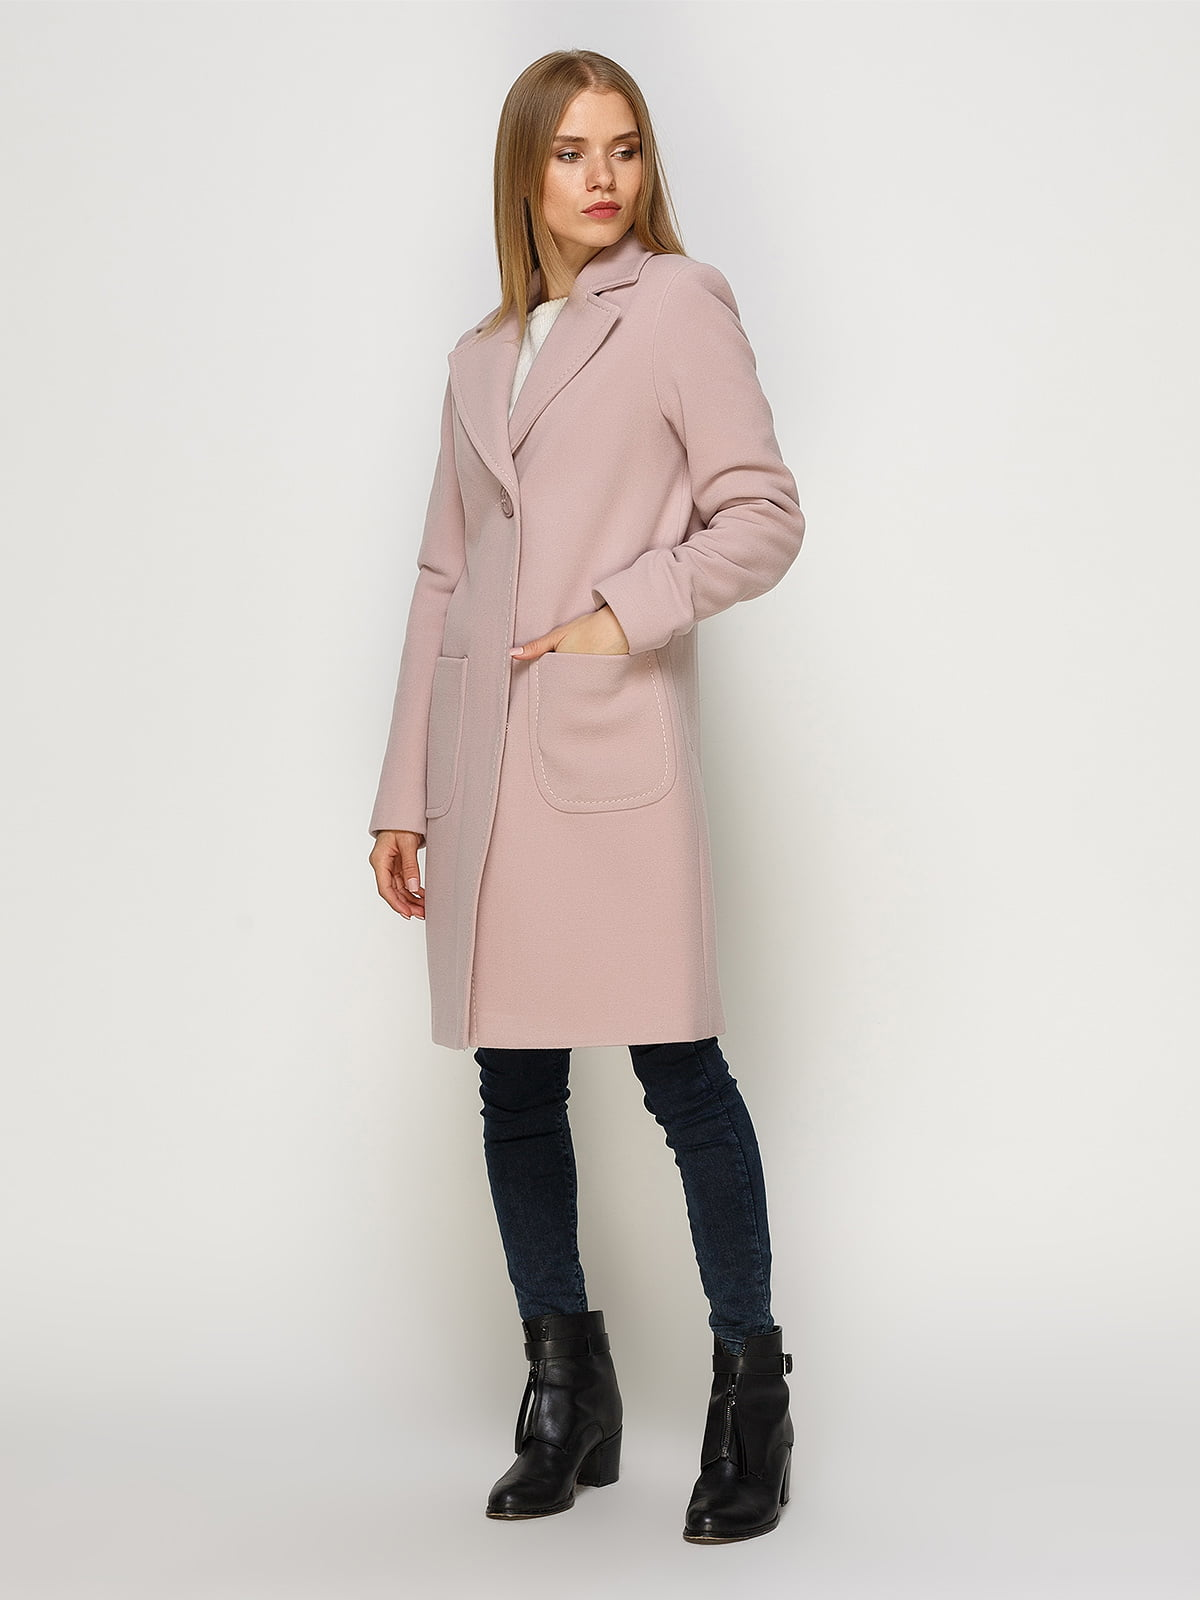 Пальто розовое   4492628   фото 2